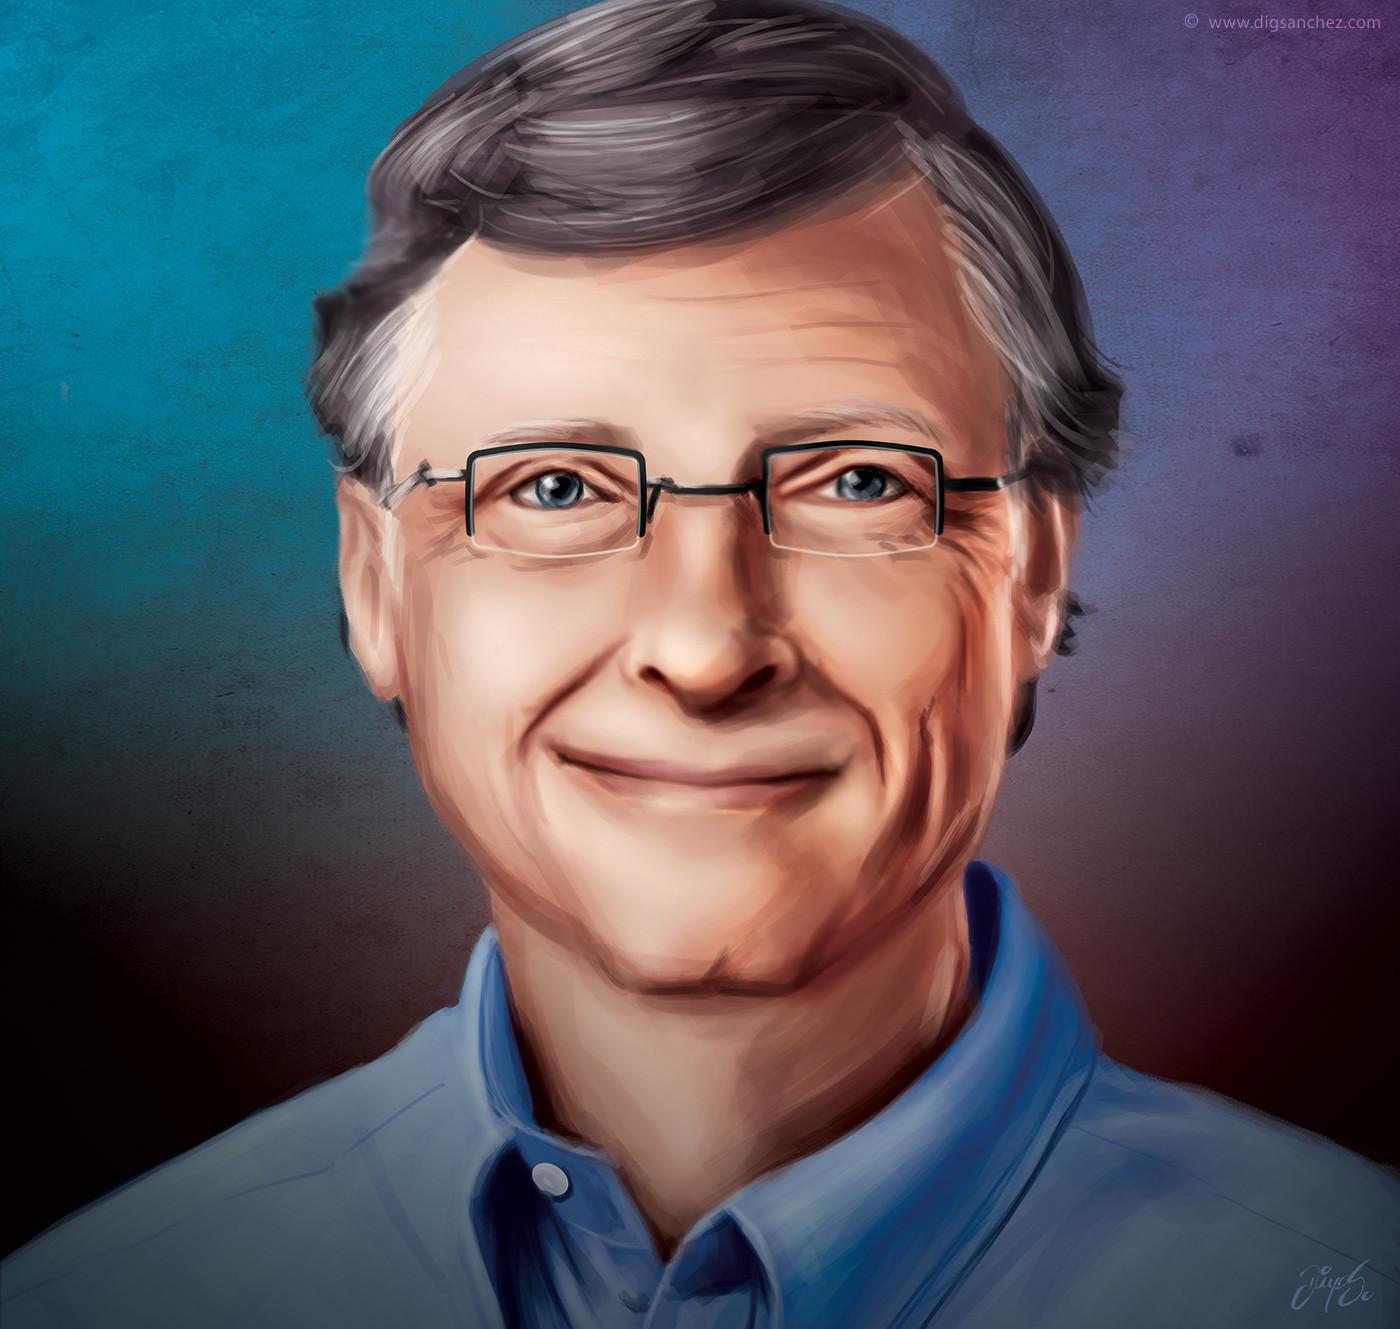 Card character - Bill Gates